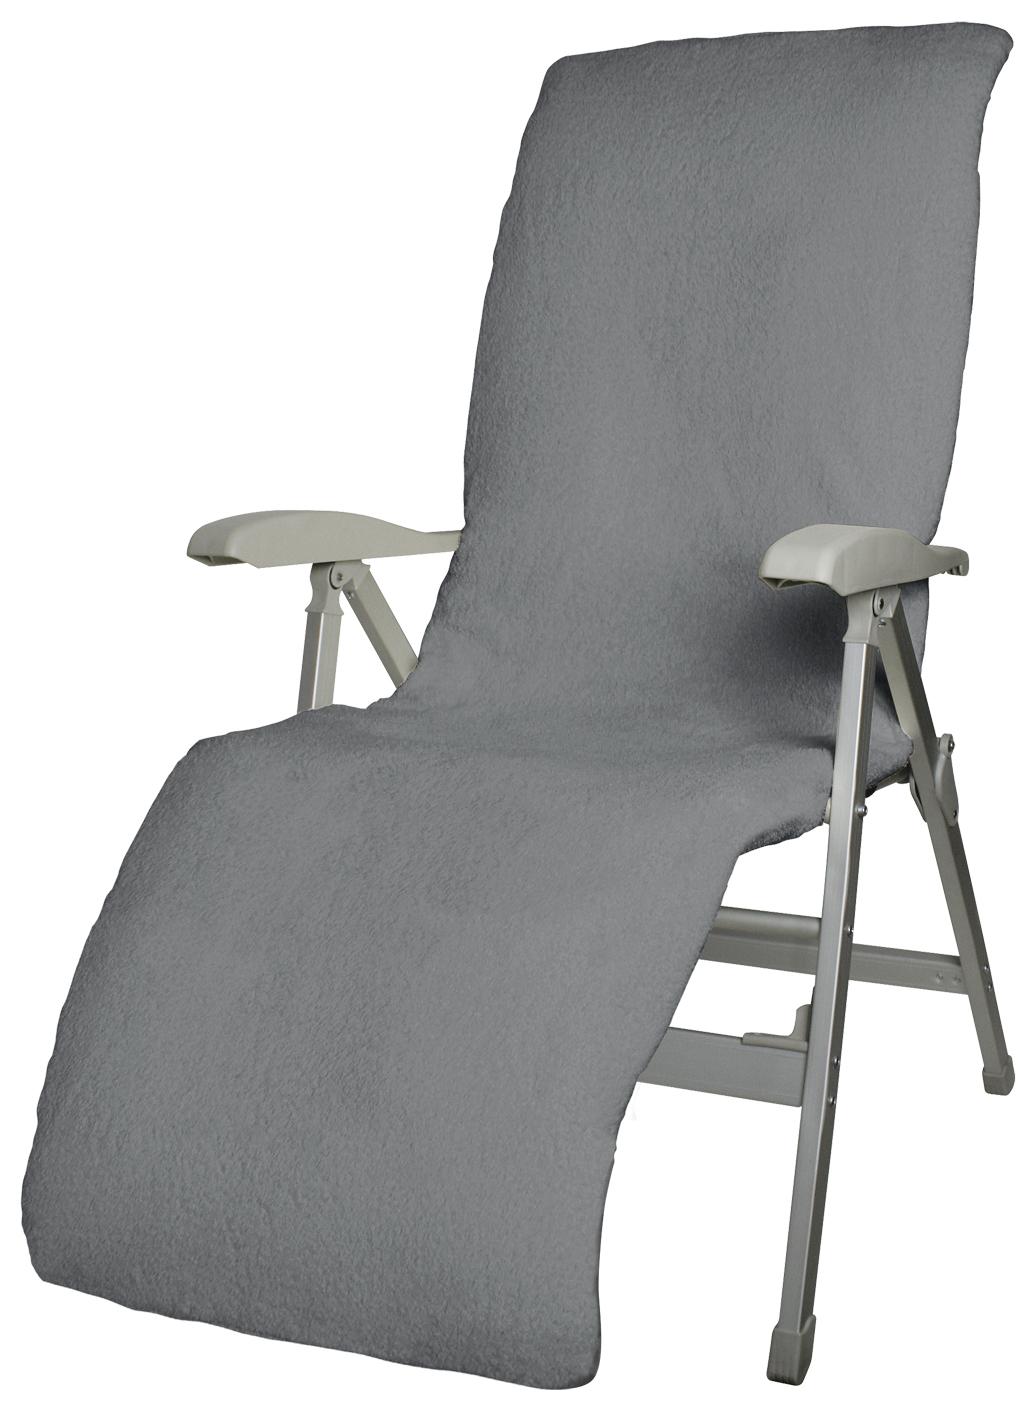 Terry Chair Cover Eurotrail